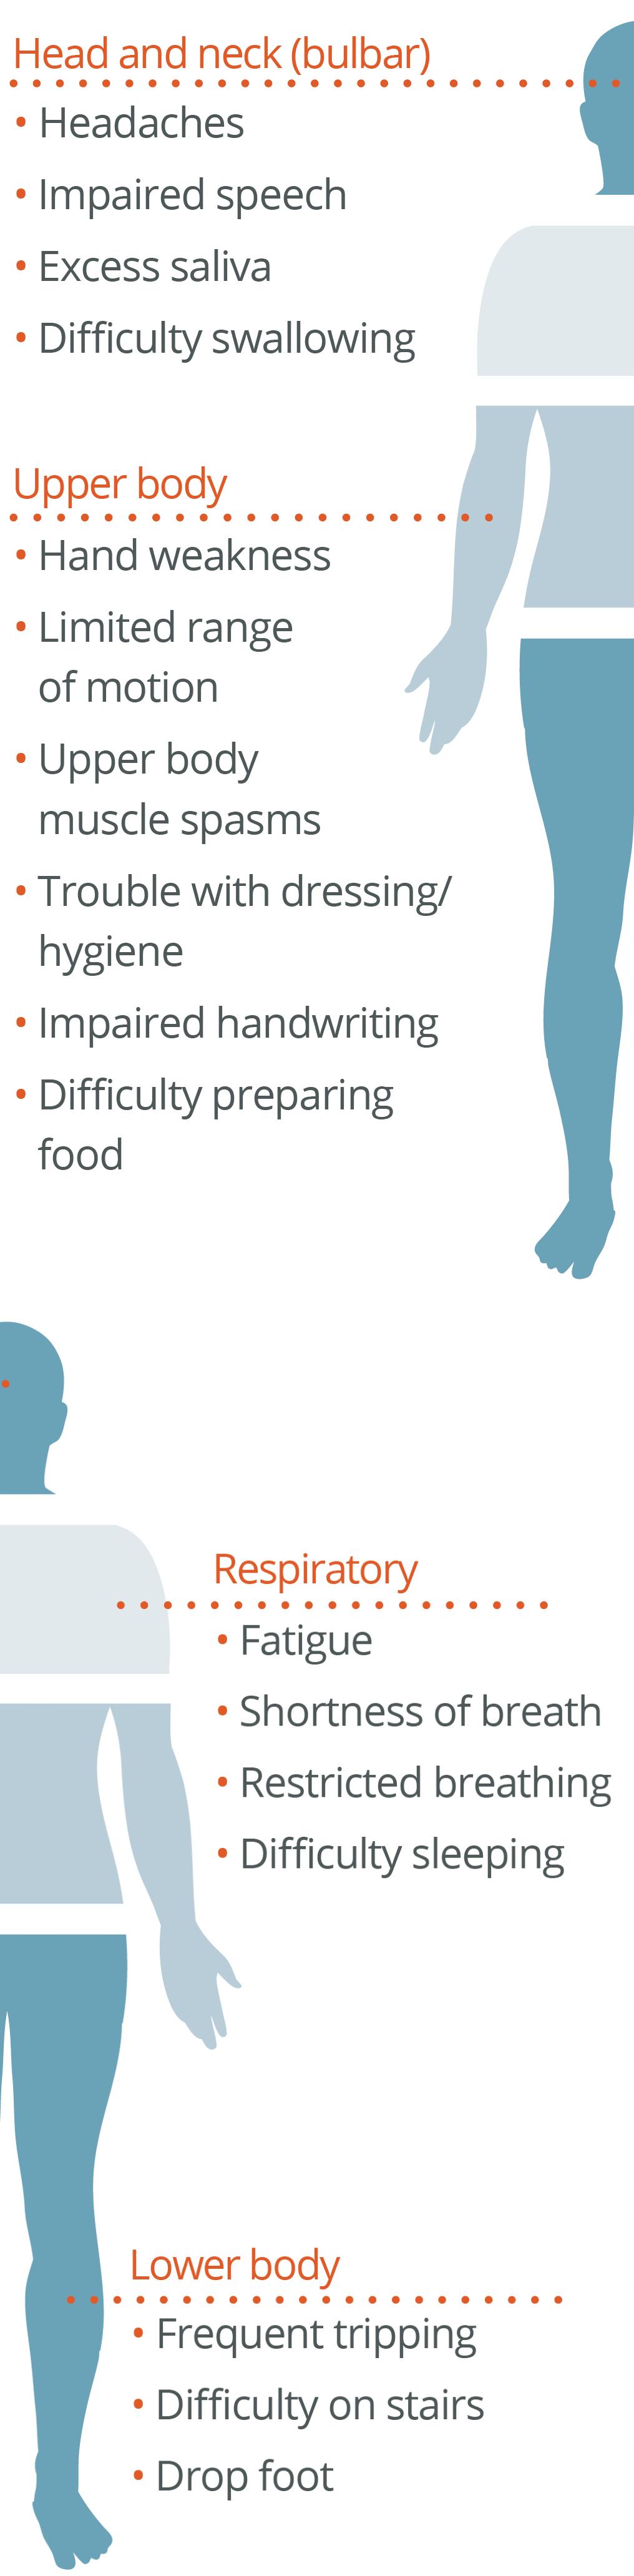 ALS types and symptoms chart